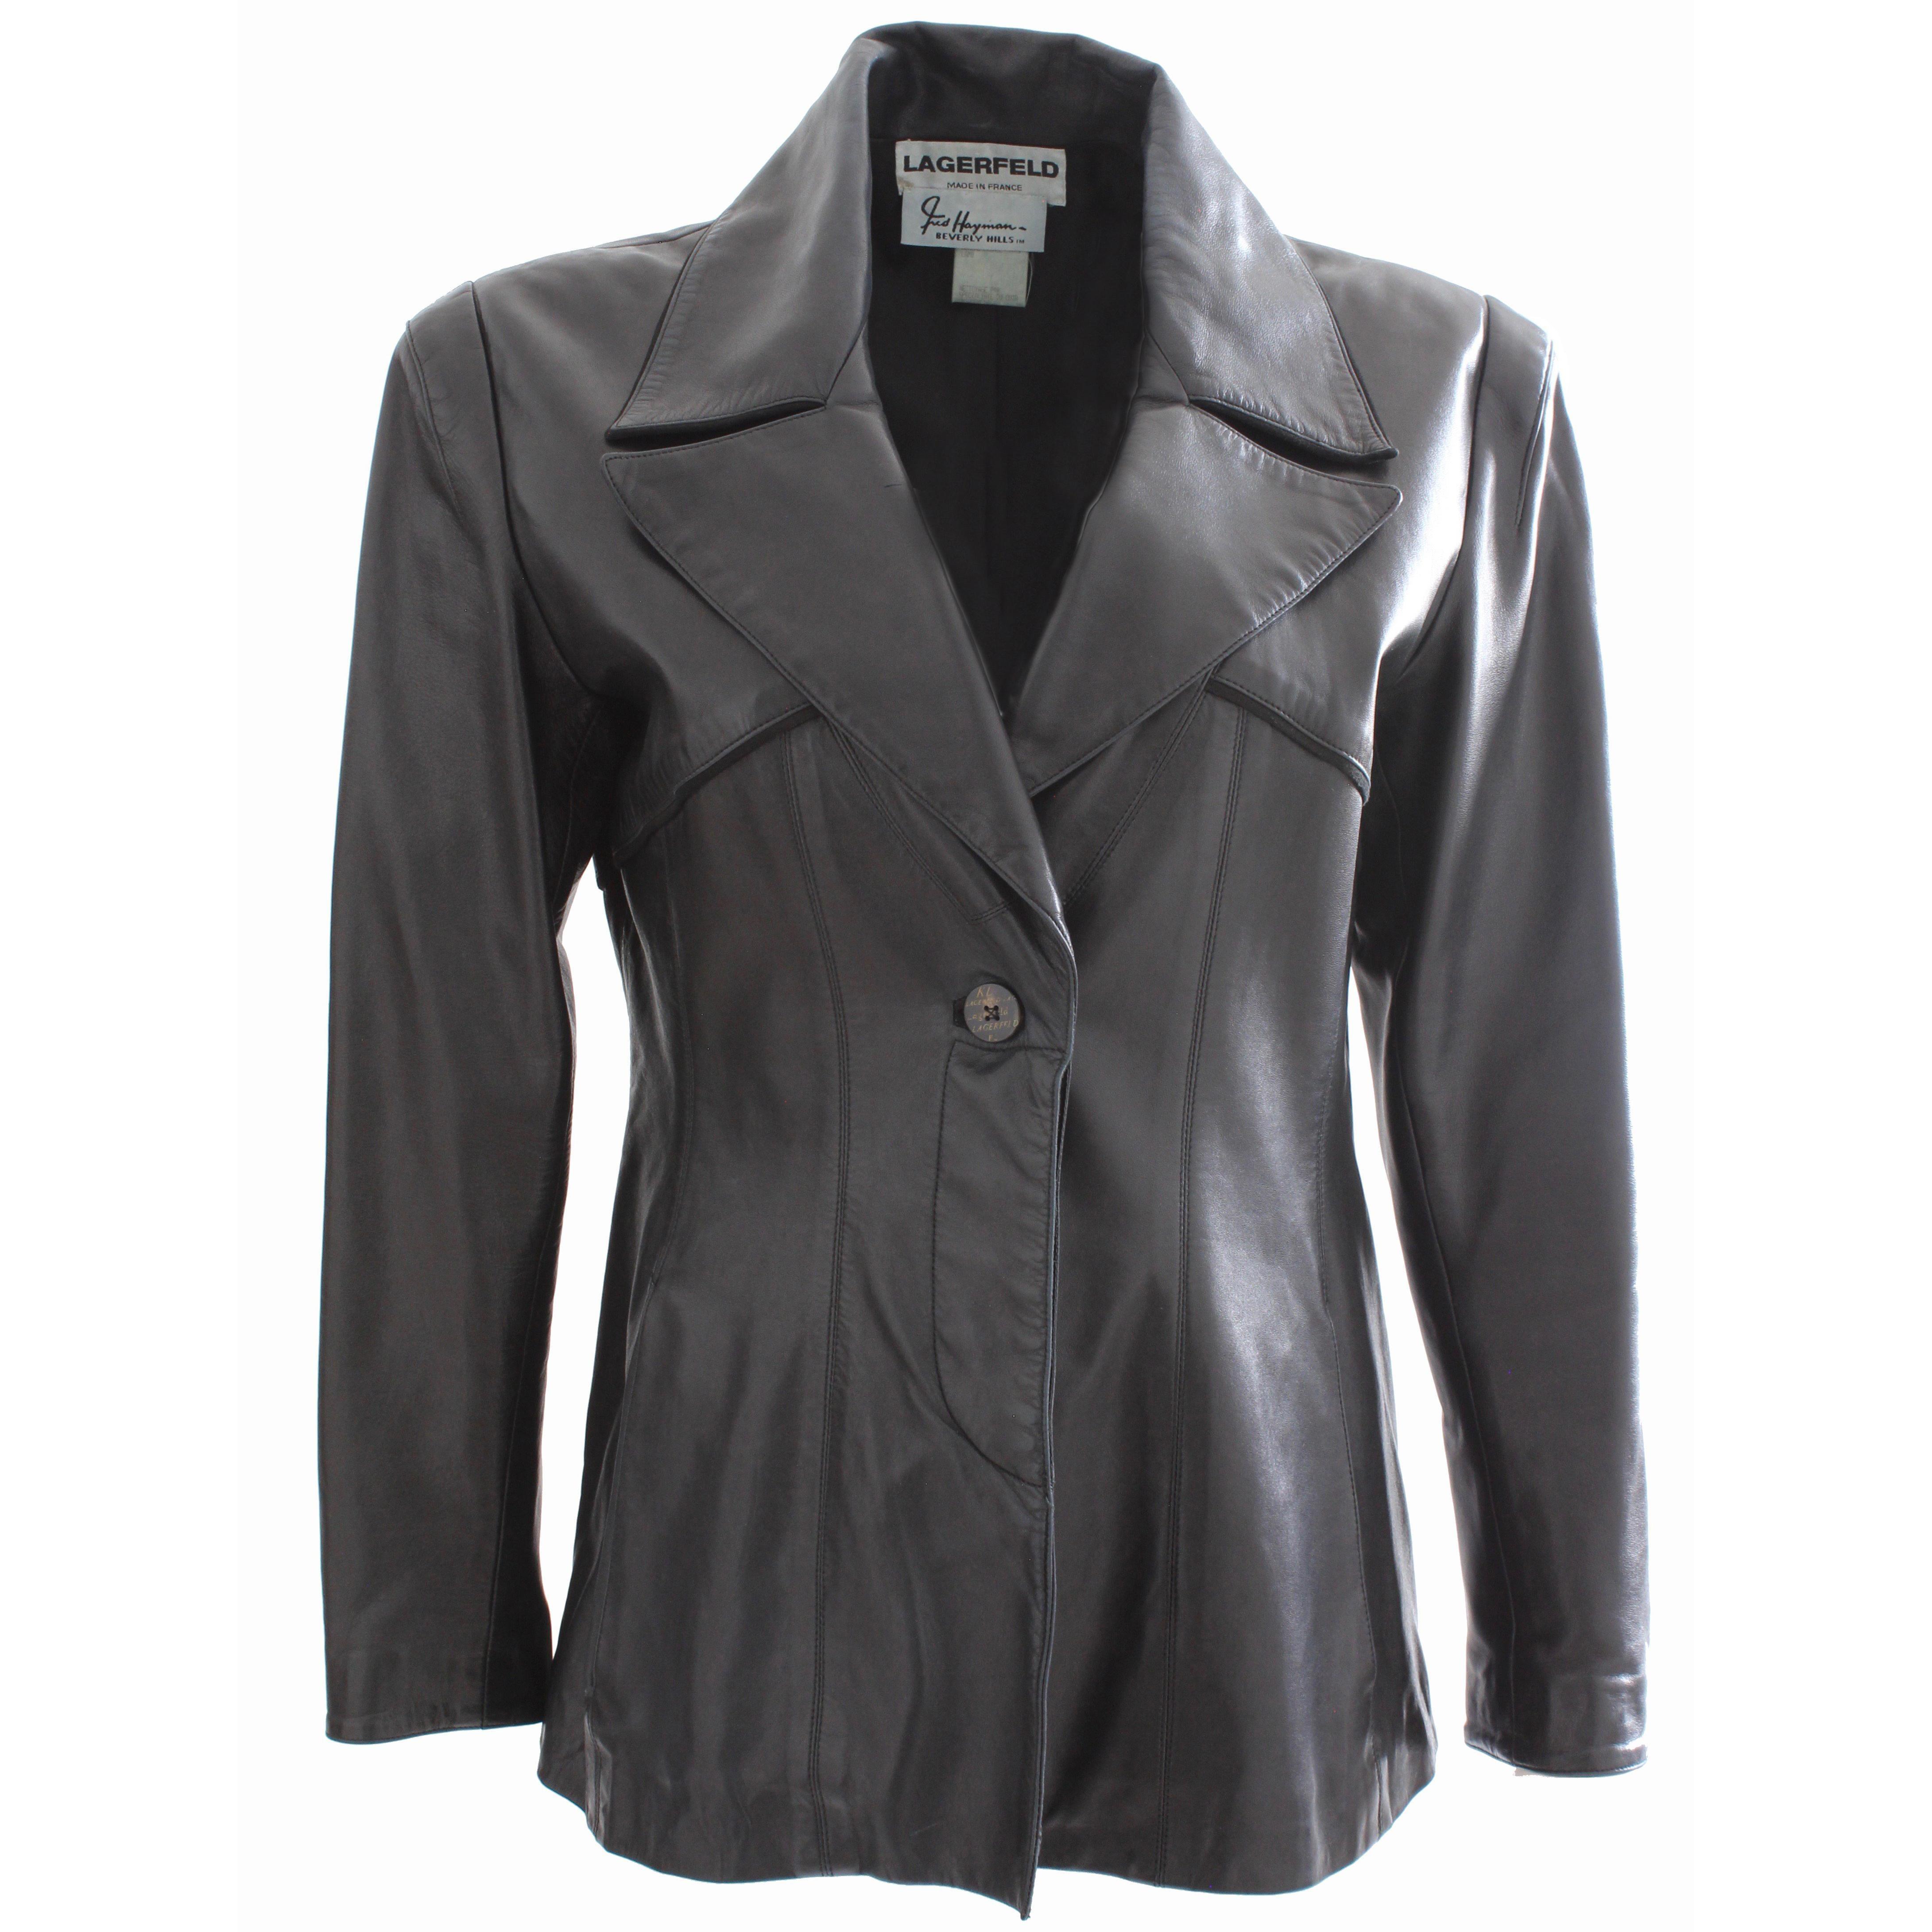 Karl Lagerfeld Black Leather Jacket Fred Hayman Beverly Hills Sz M